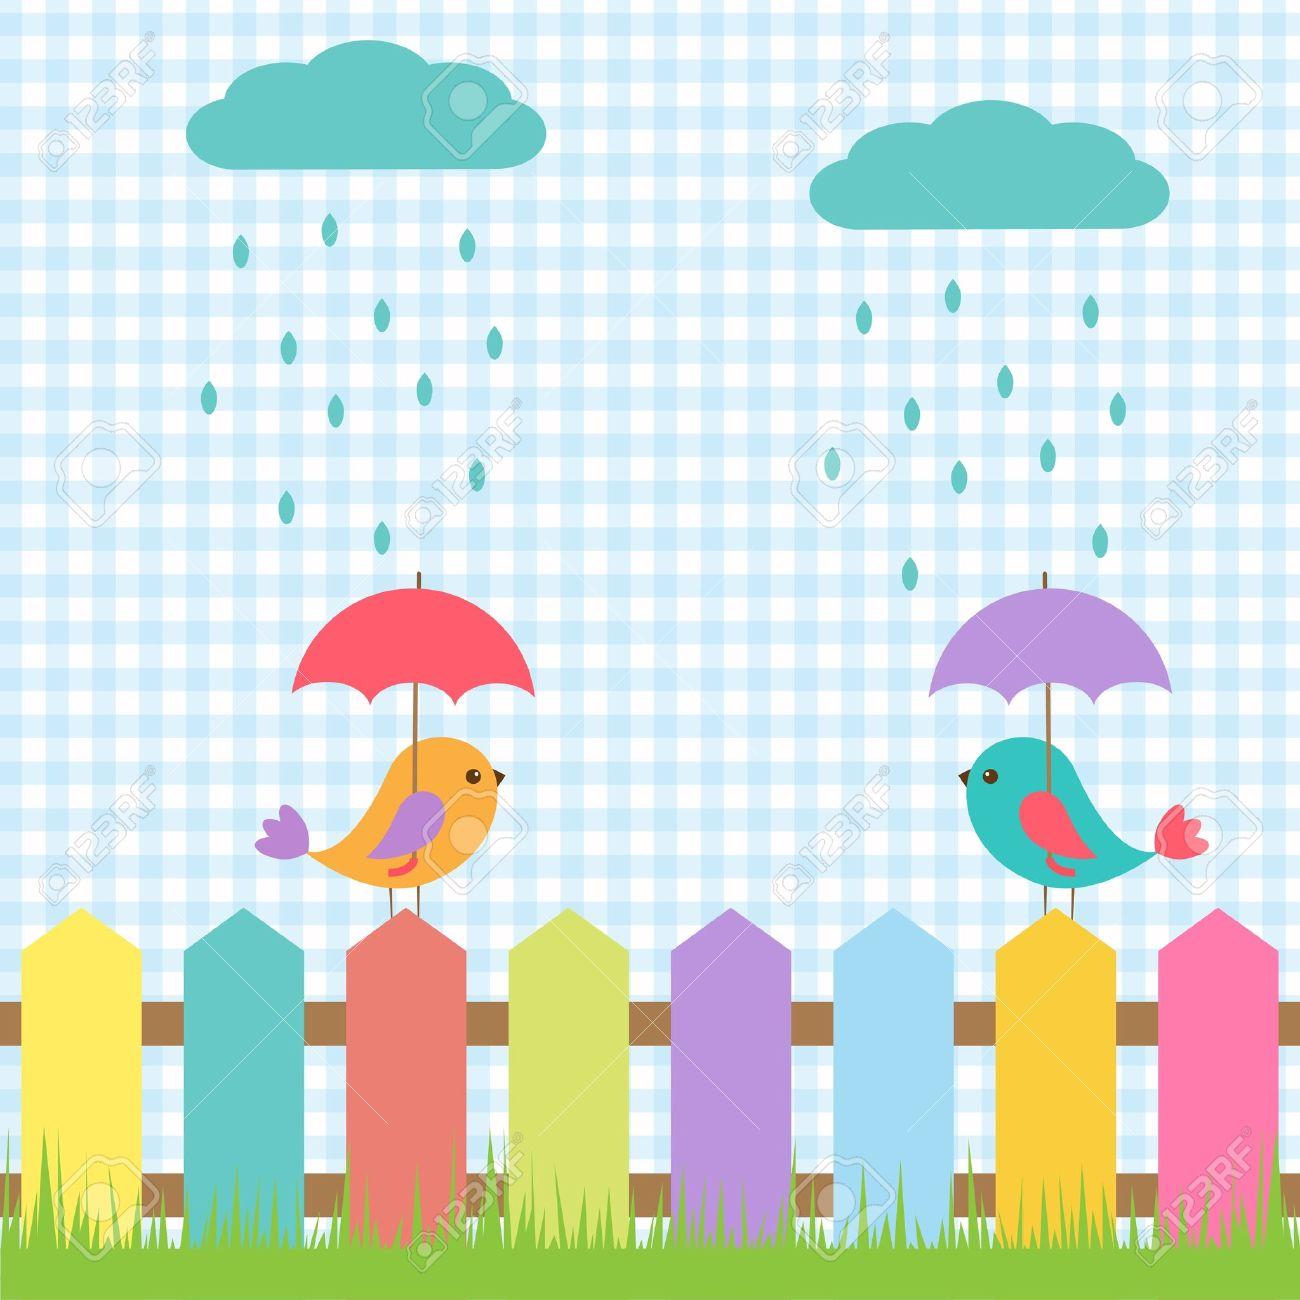 Background with birds under umbrellas Stock Vector - 15028349